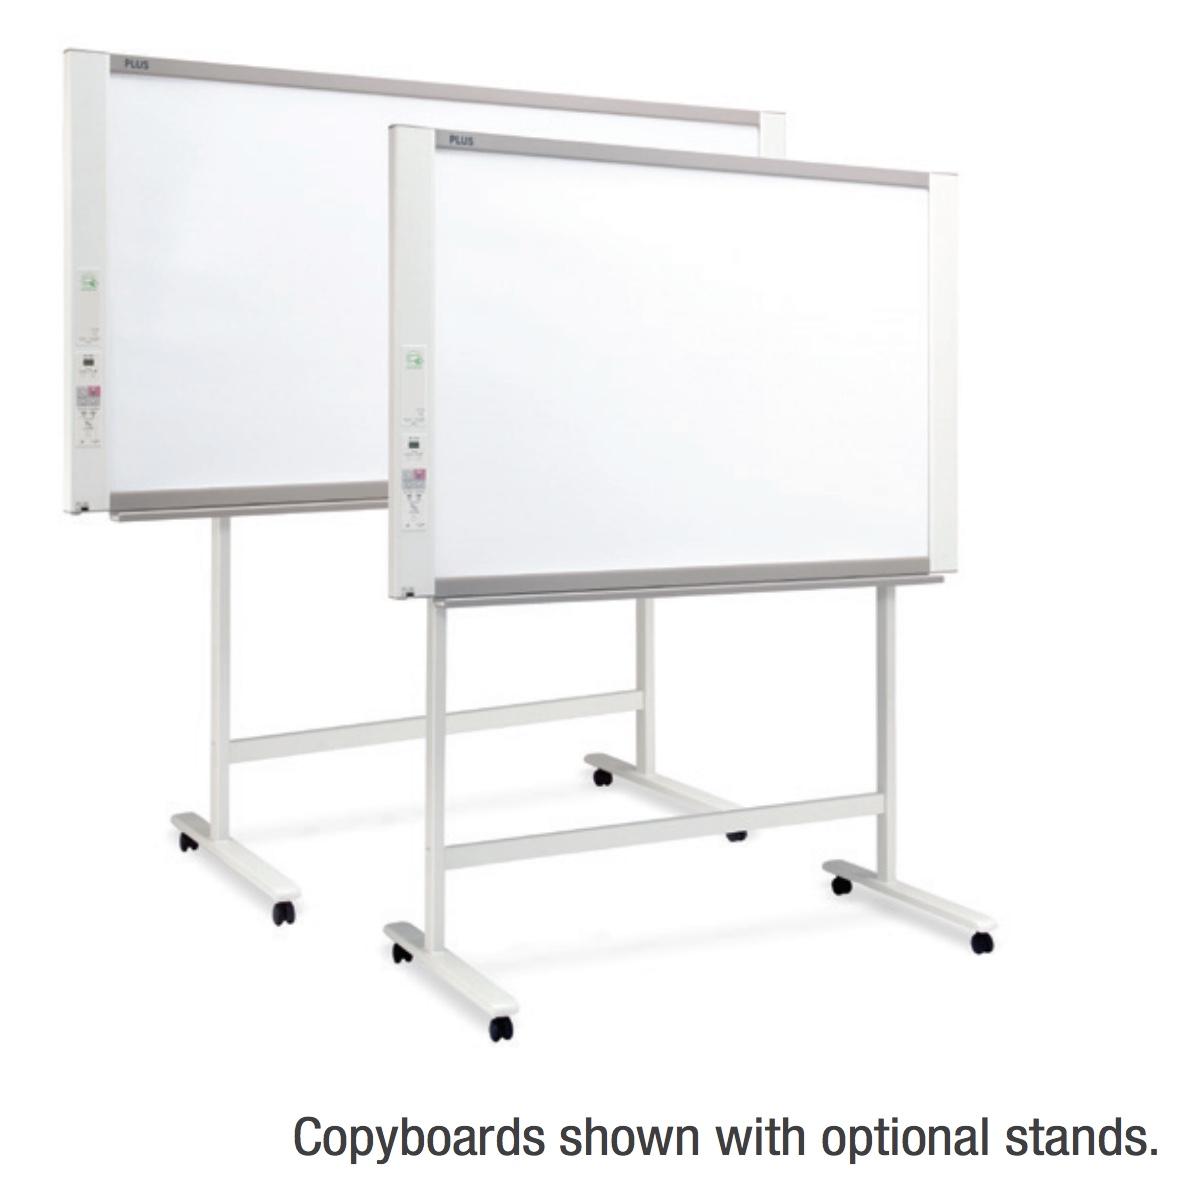 PLUS Copyboard N-324